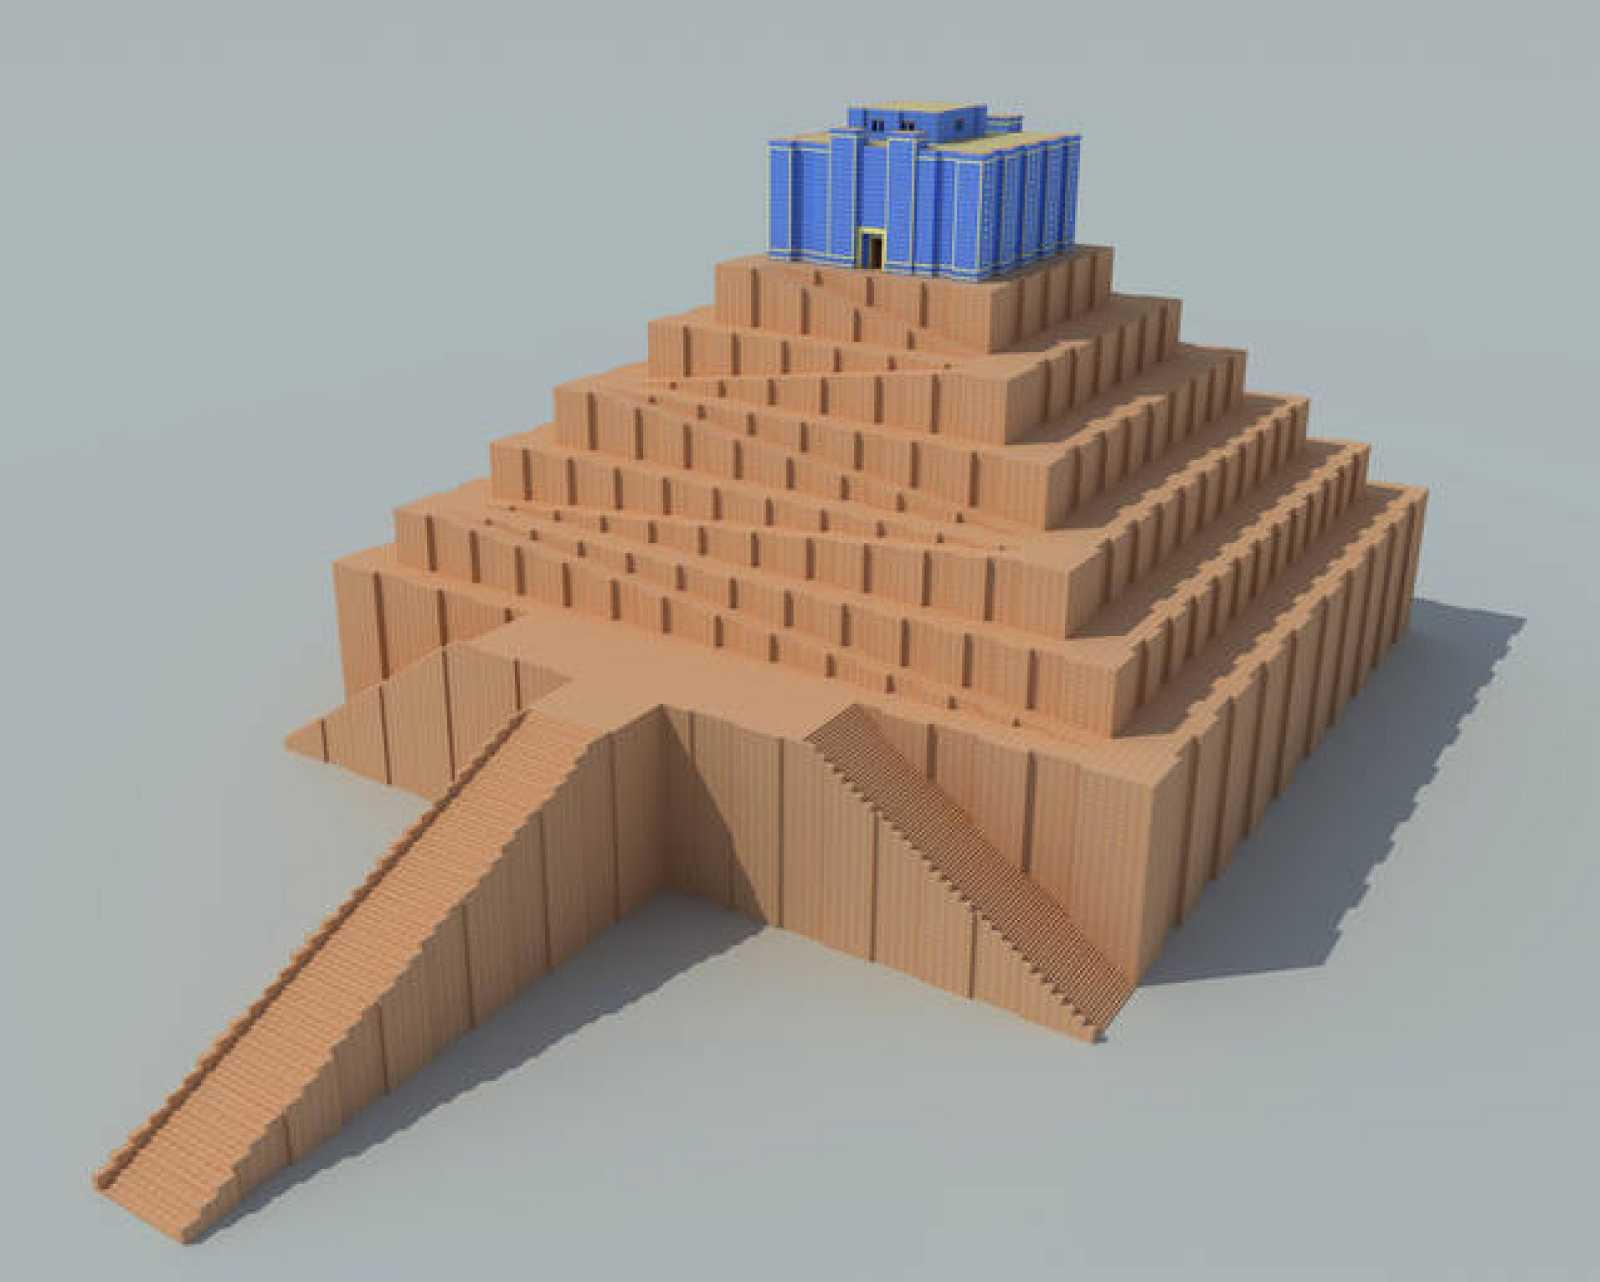 Maqueta que recrea la hipótesis española sobre el aspecto de la Torre de Babel